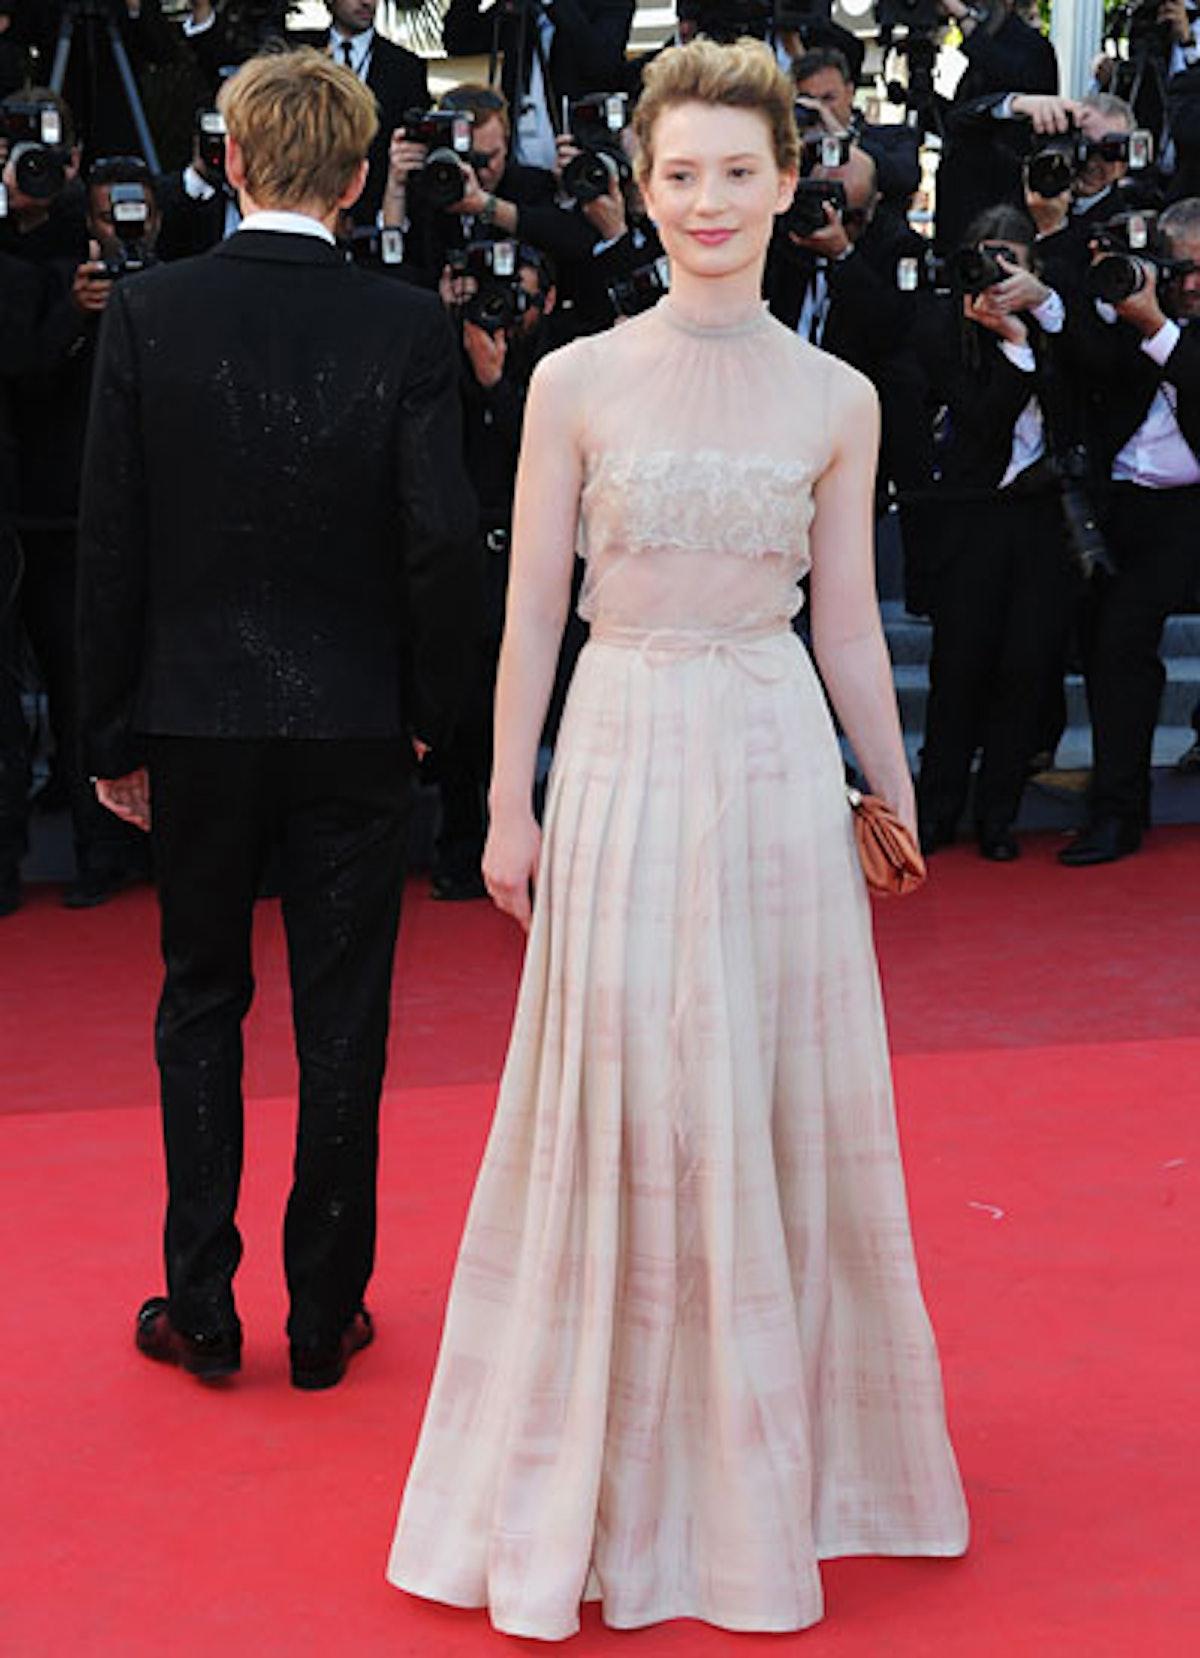 cess-mia-wasikowska-red-carpet-lookbook-06-v.jpg